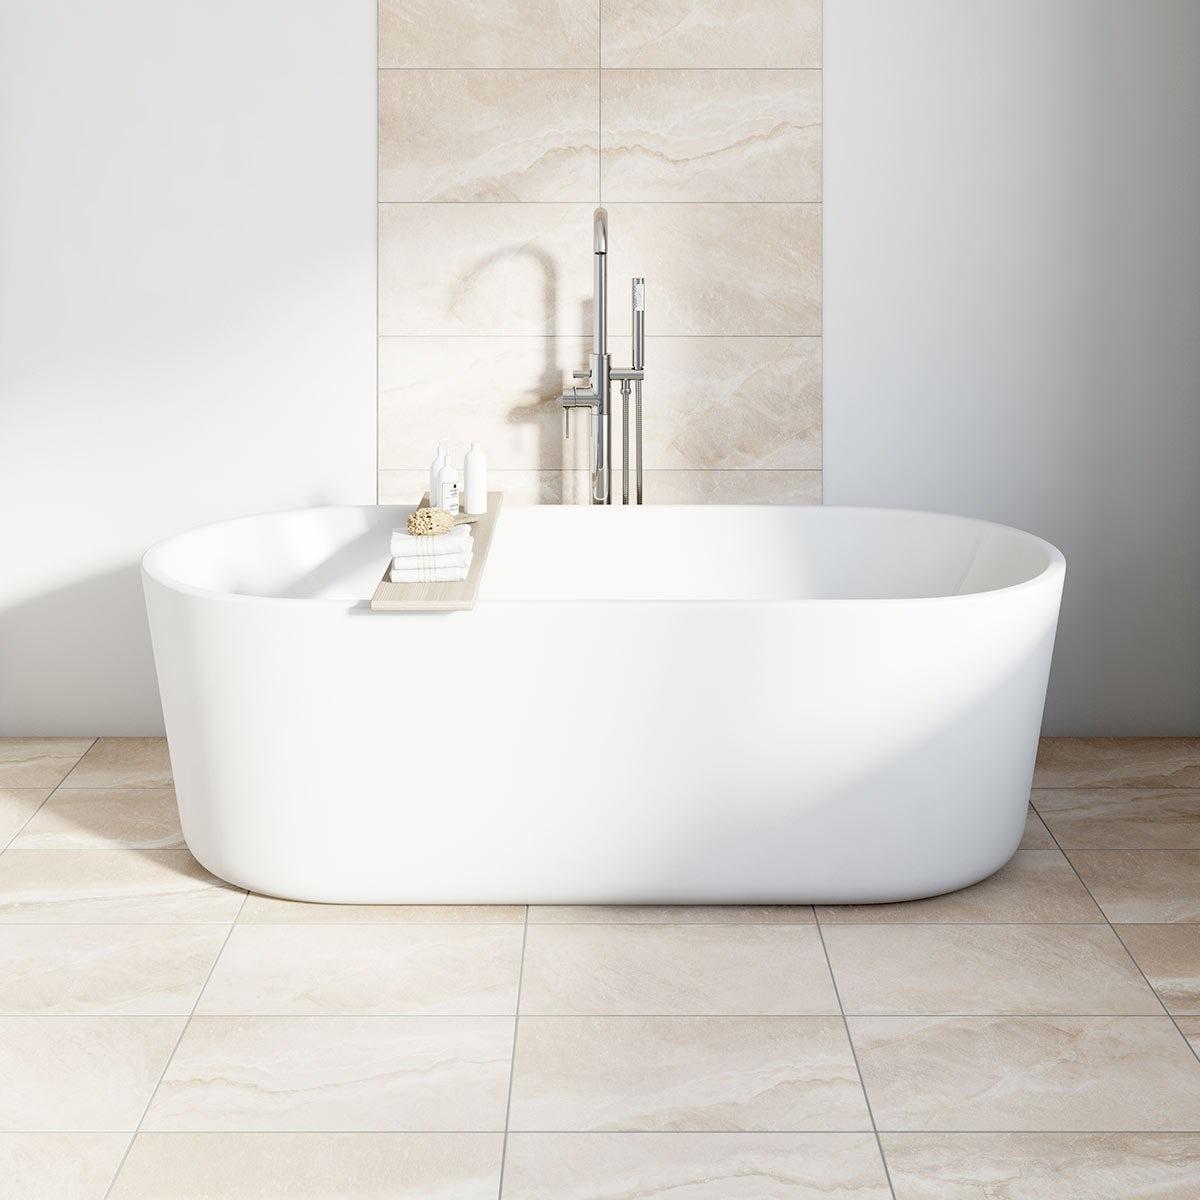 British Ceramic Tile stone sand beige matt tile 298mm x 498mm